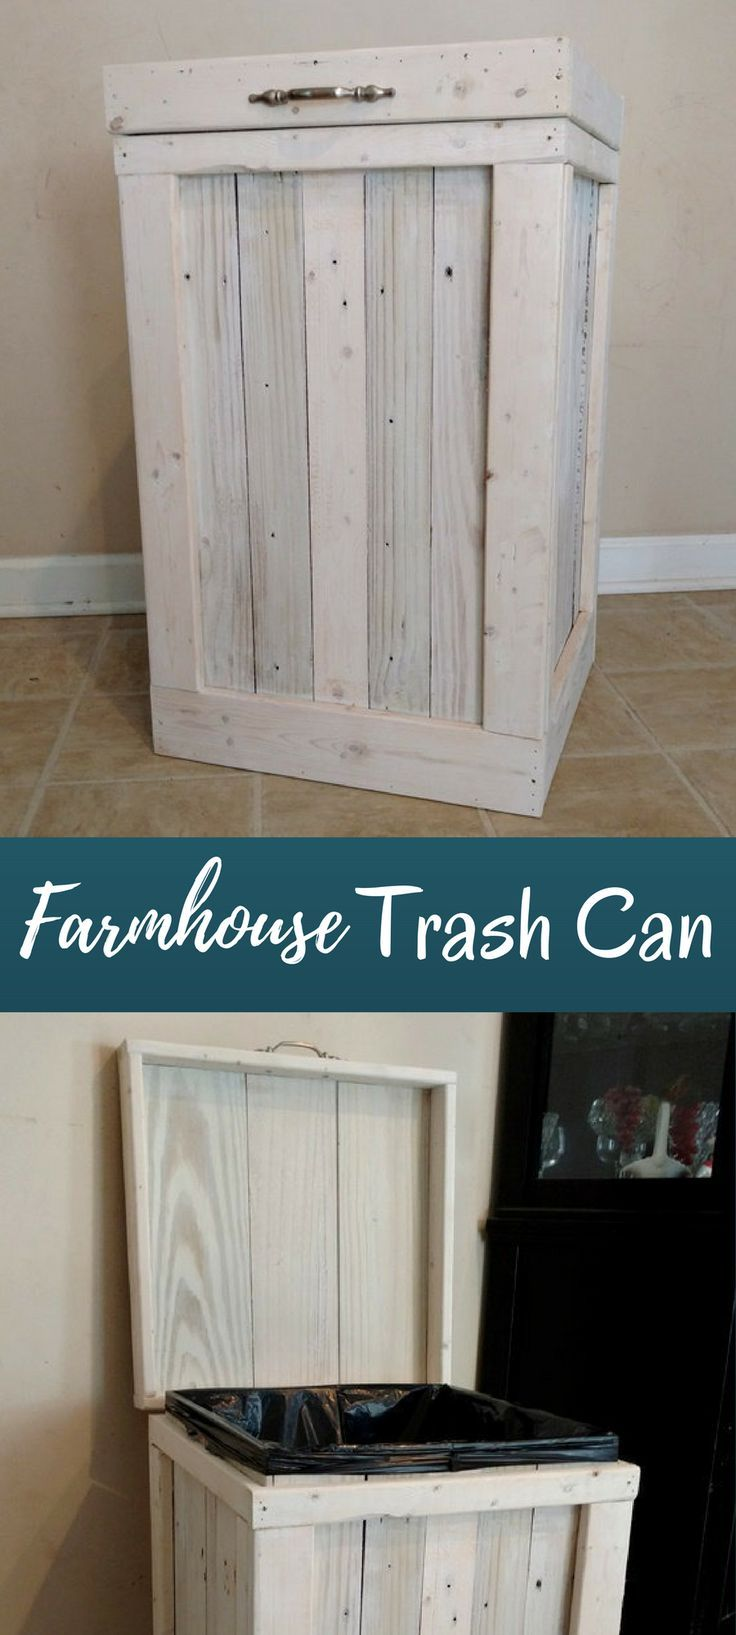 47++ Farmhouse kitchen garbage can ideas in 2021